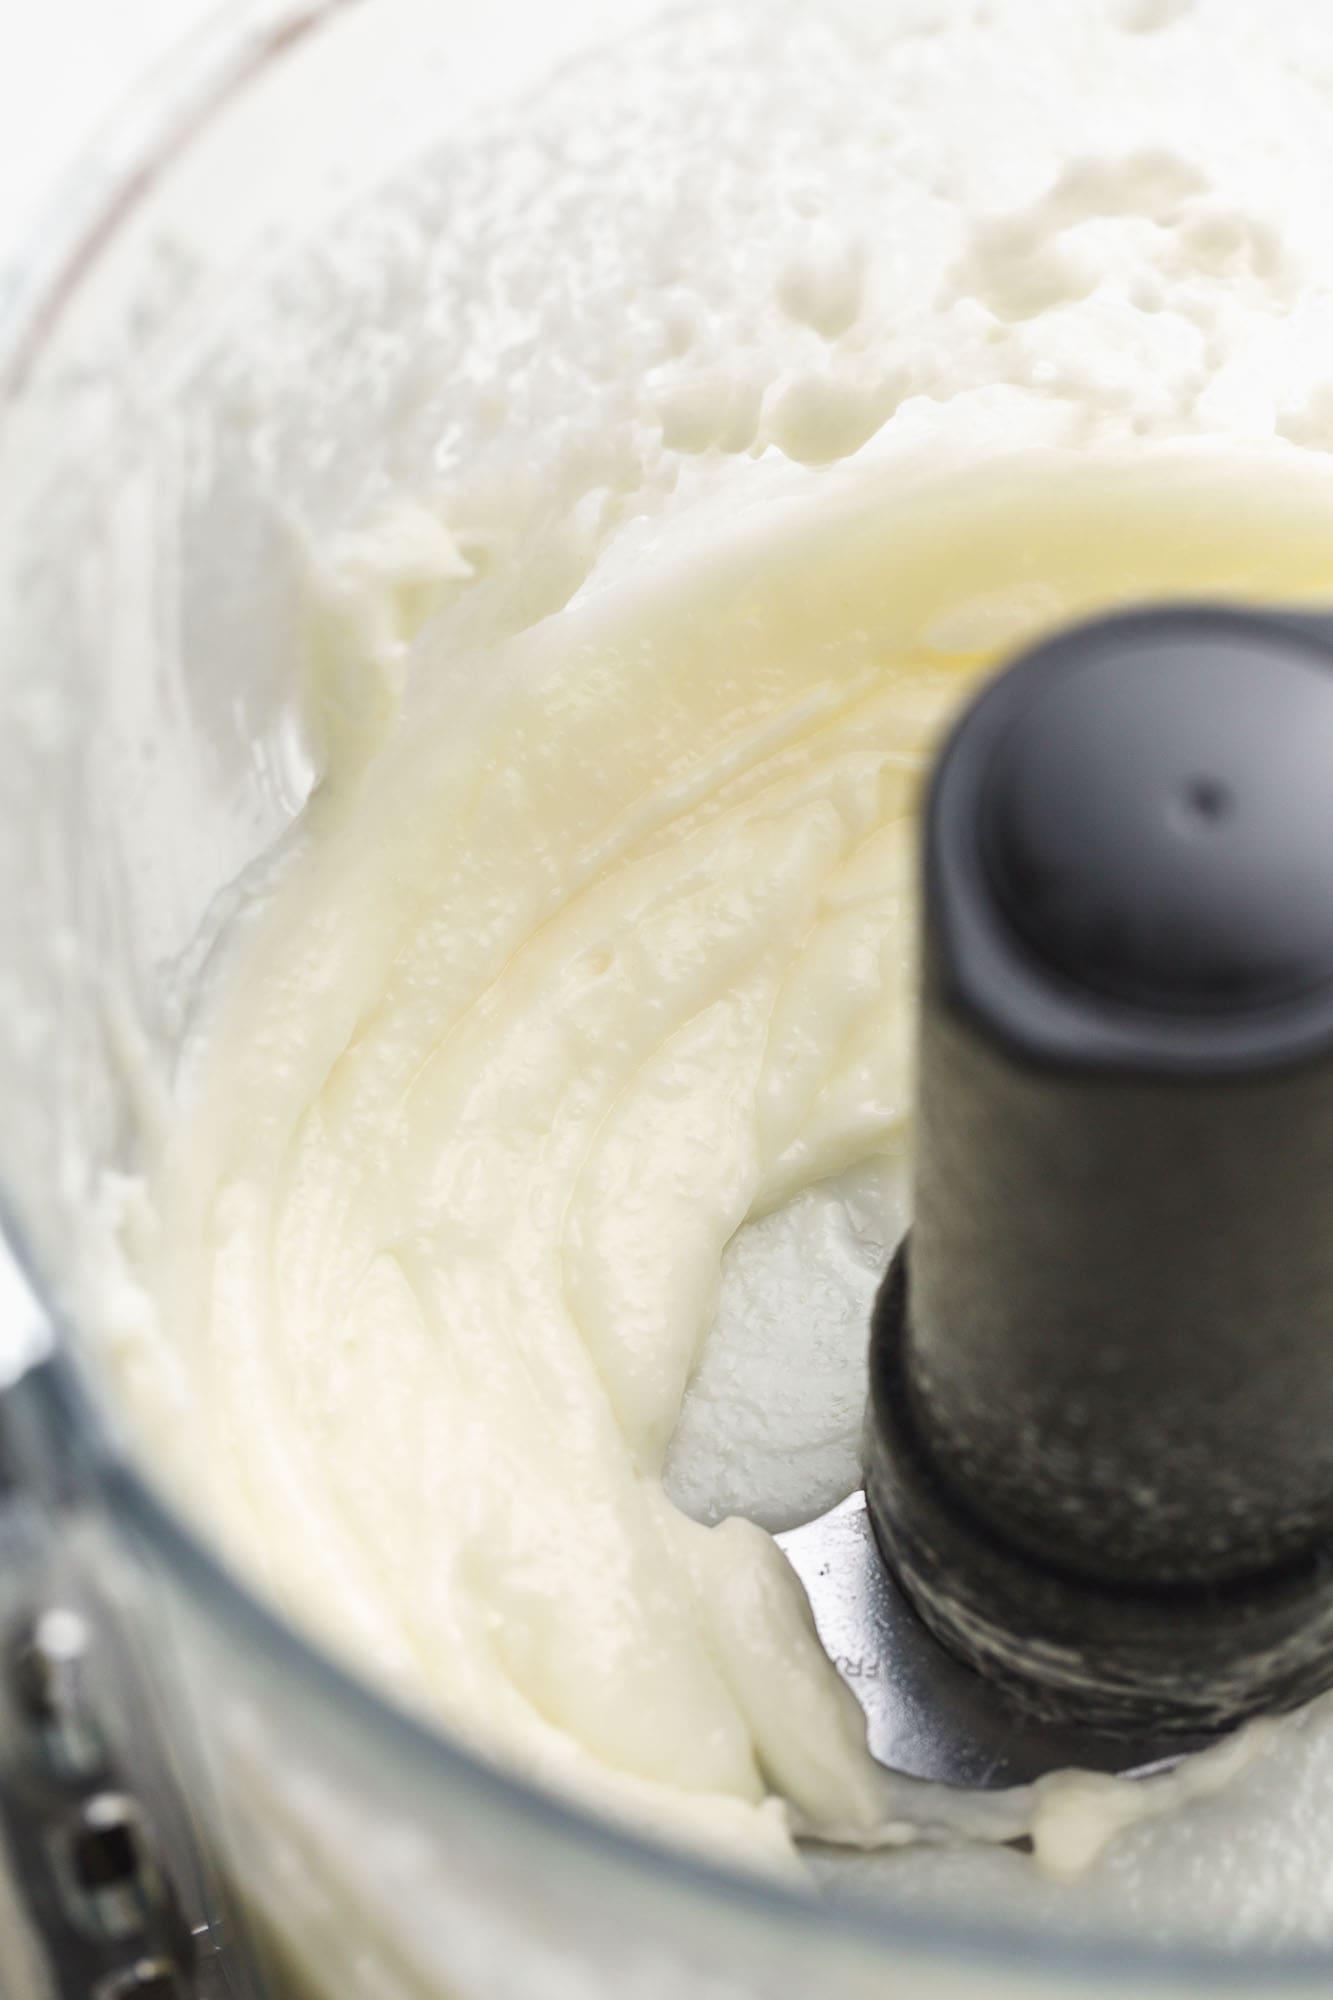 A close up shot of garlic sauce in a food processor bowl